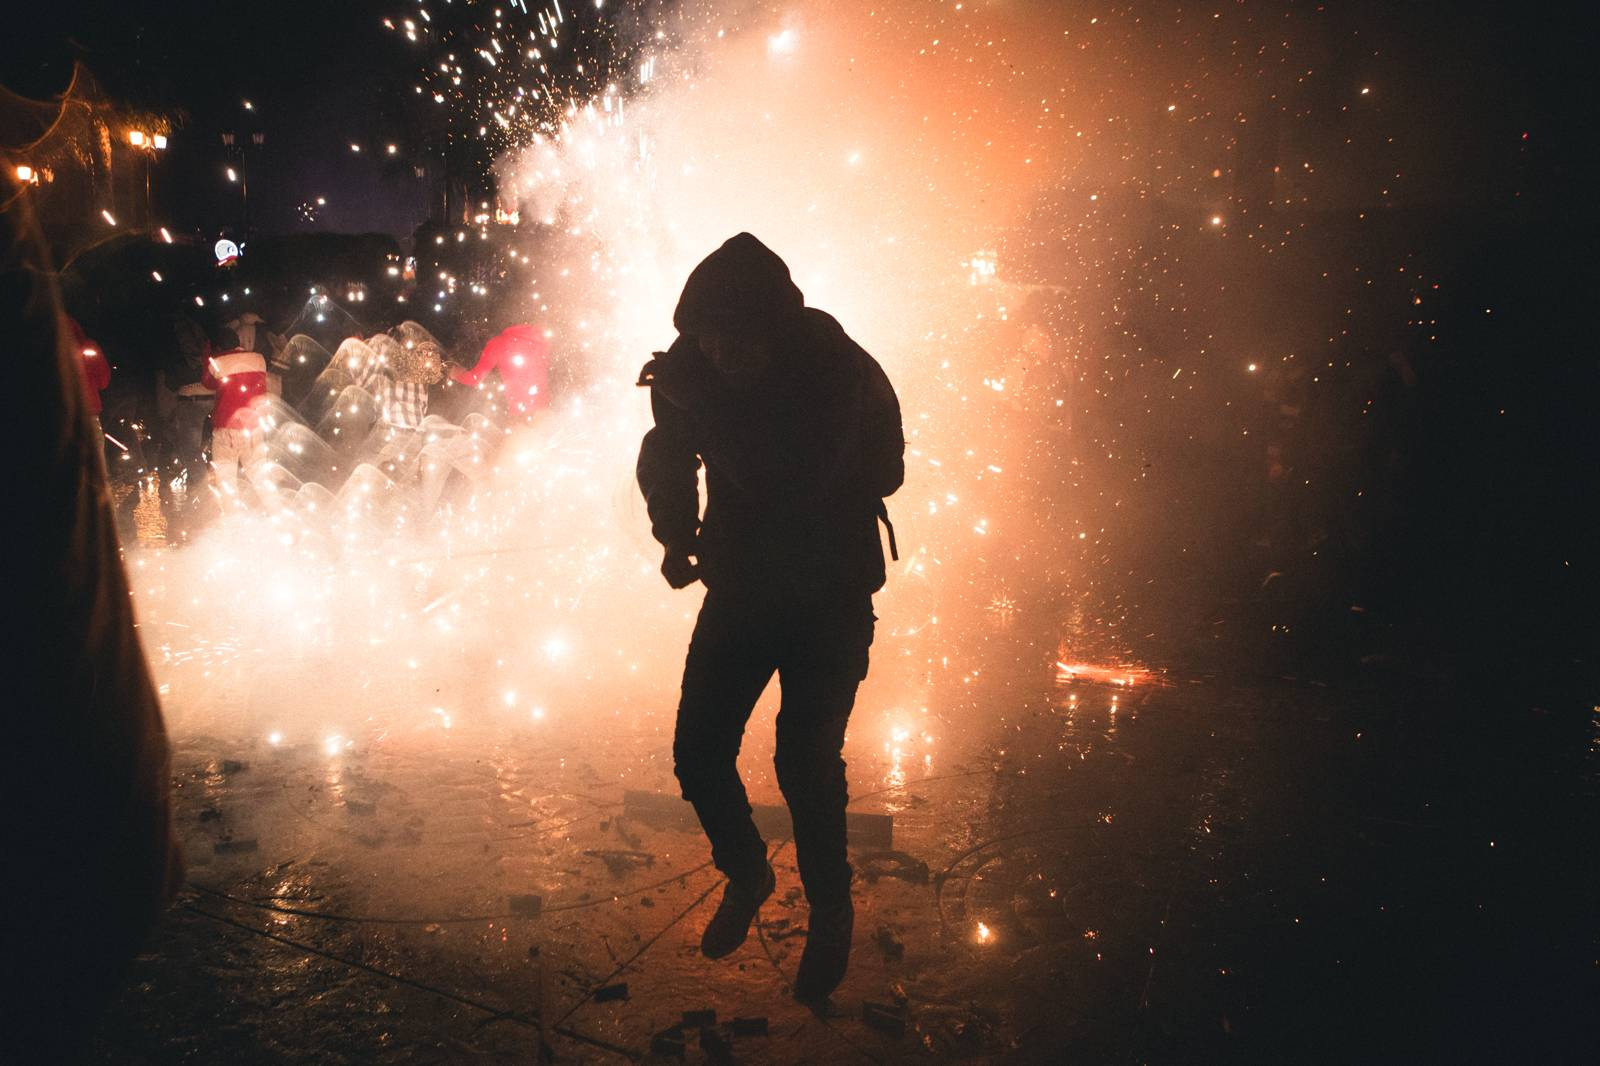 Mexico-Pyrotechnics-Dan-Medhurst-1144